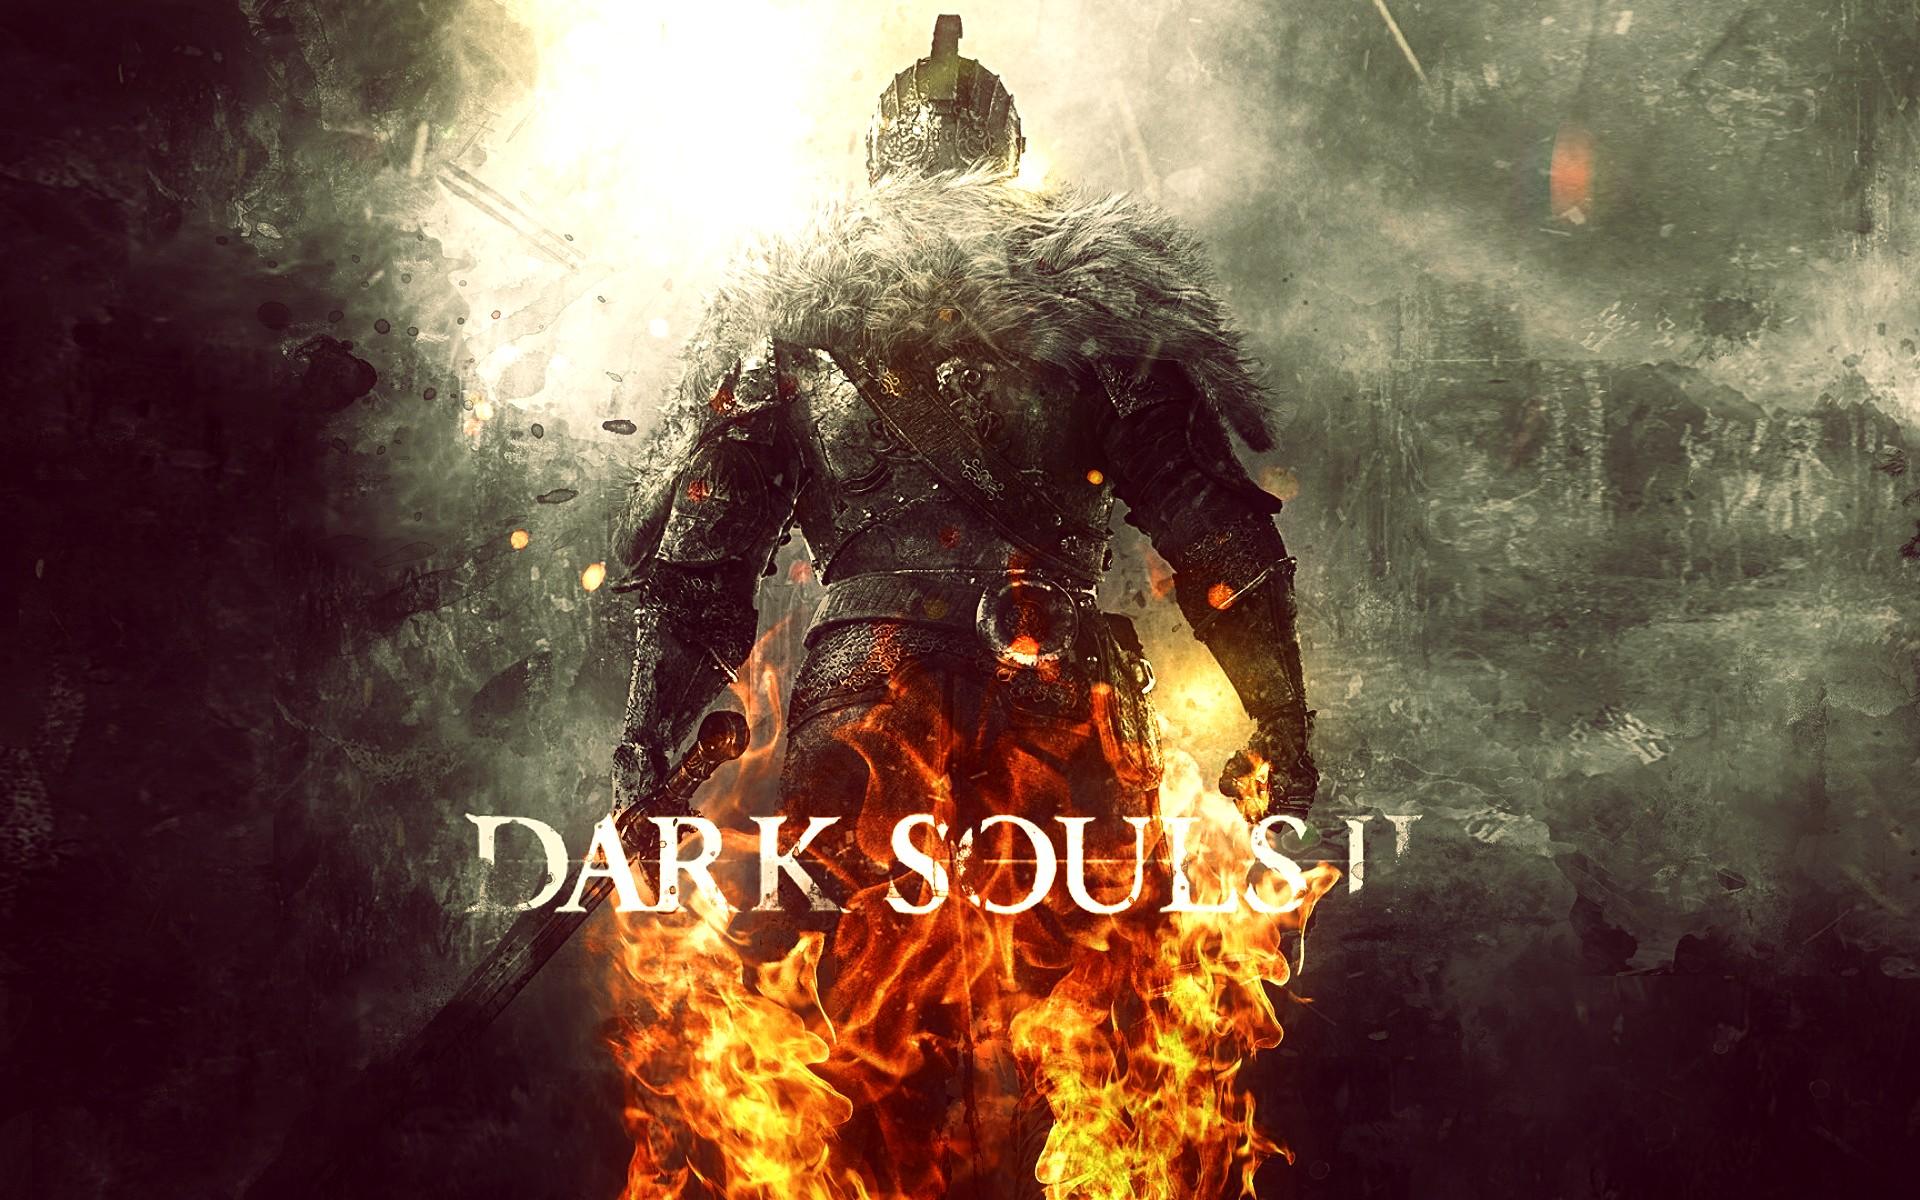 43+ Dark Souls Wallpapers ·① Download Free Stunning HD